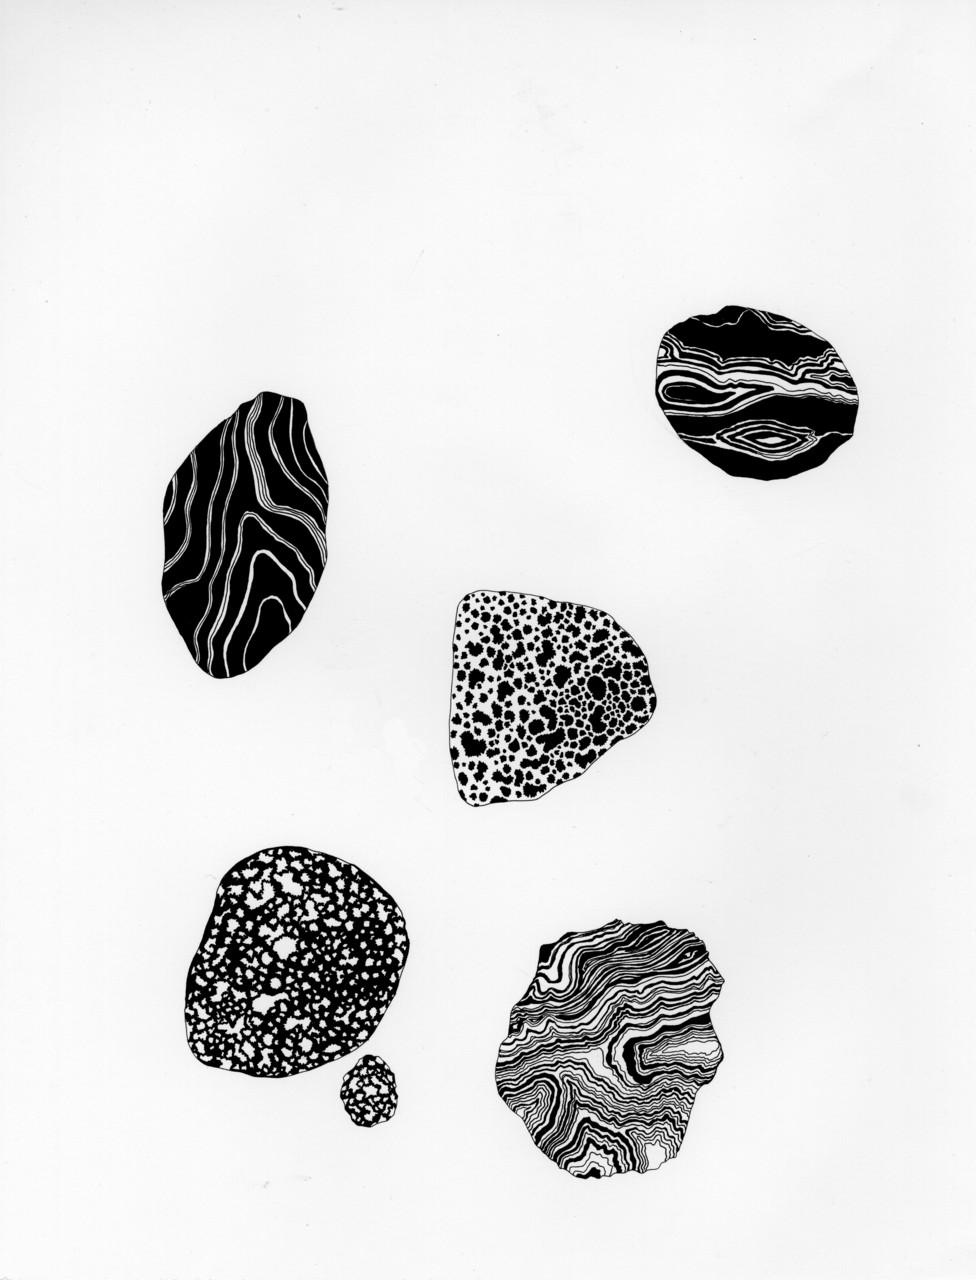 Stone Study, 2010